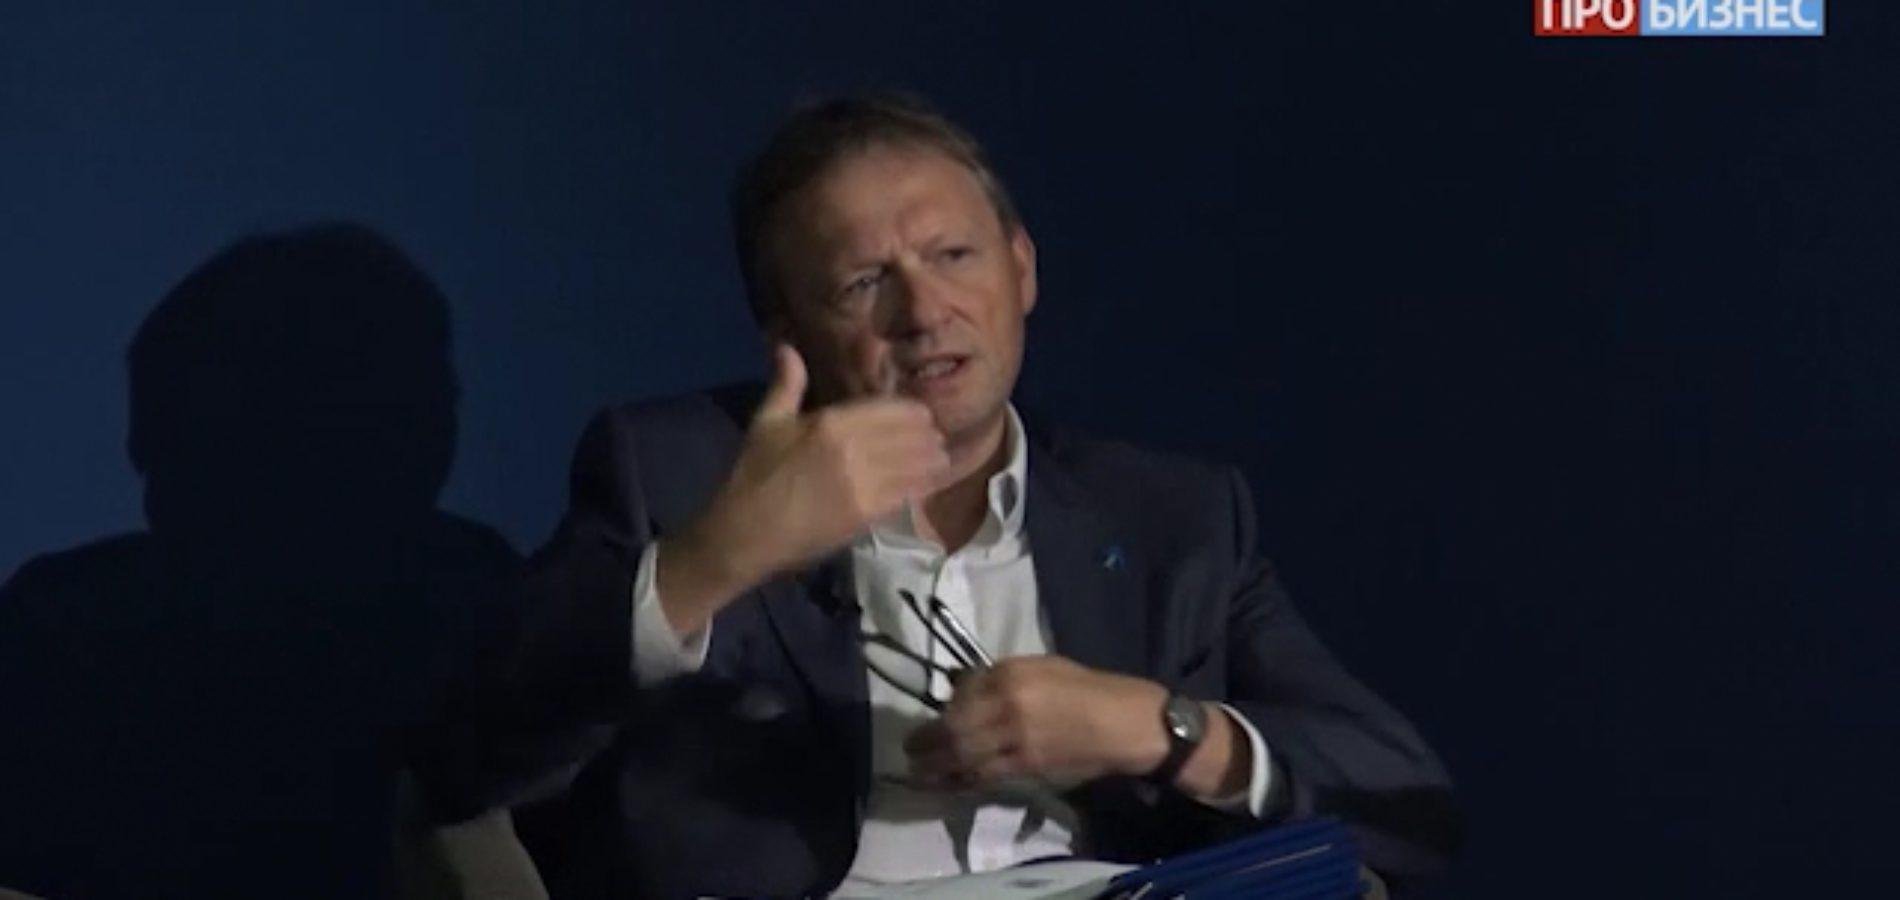 Программа «Стратегия Роста» на телеканале «Про бизнес». Третья серия